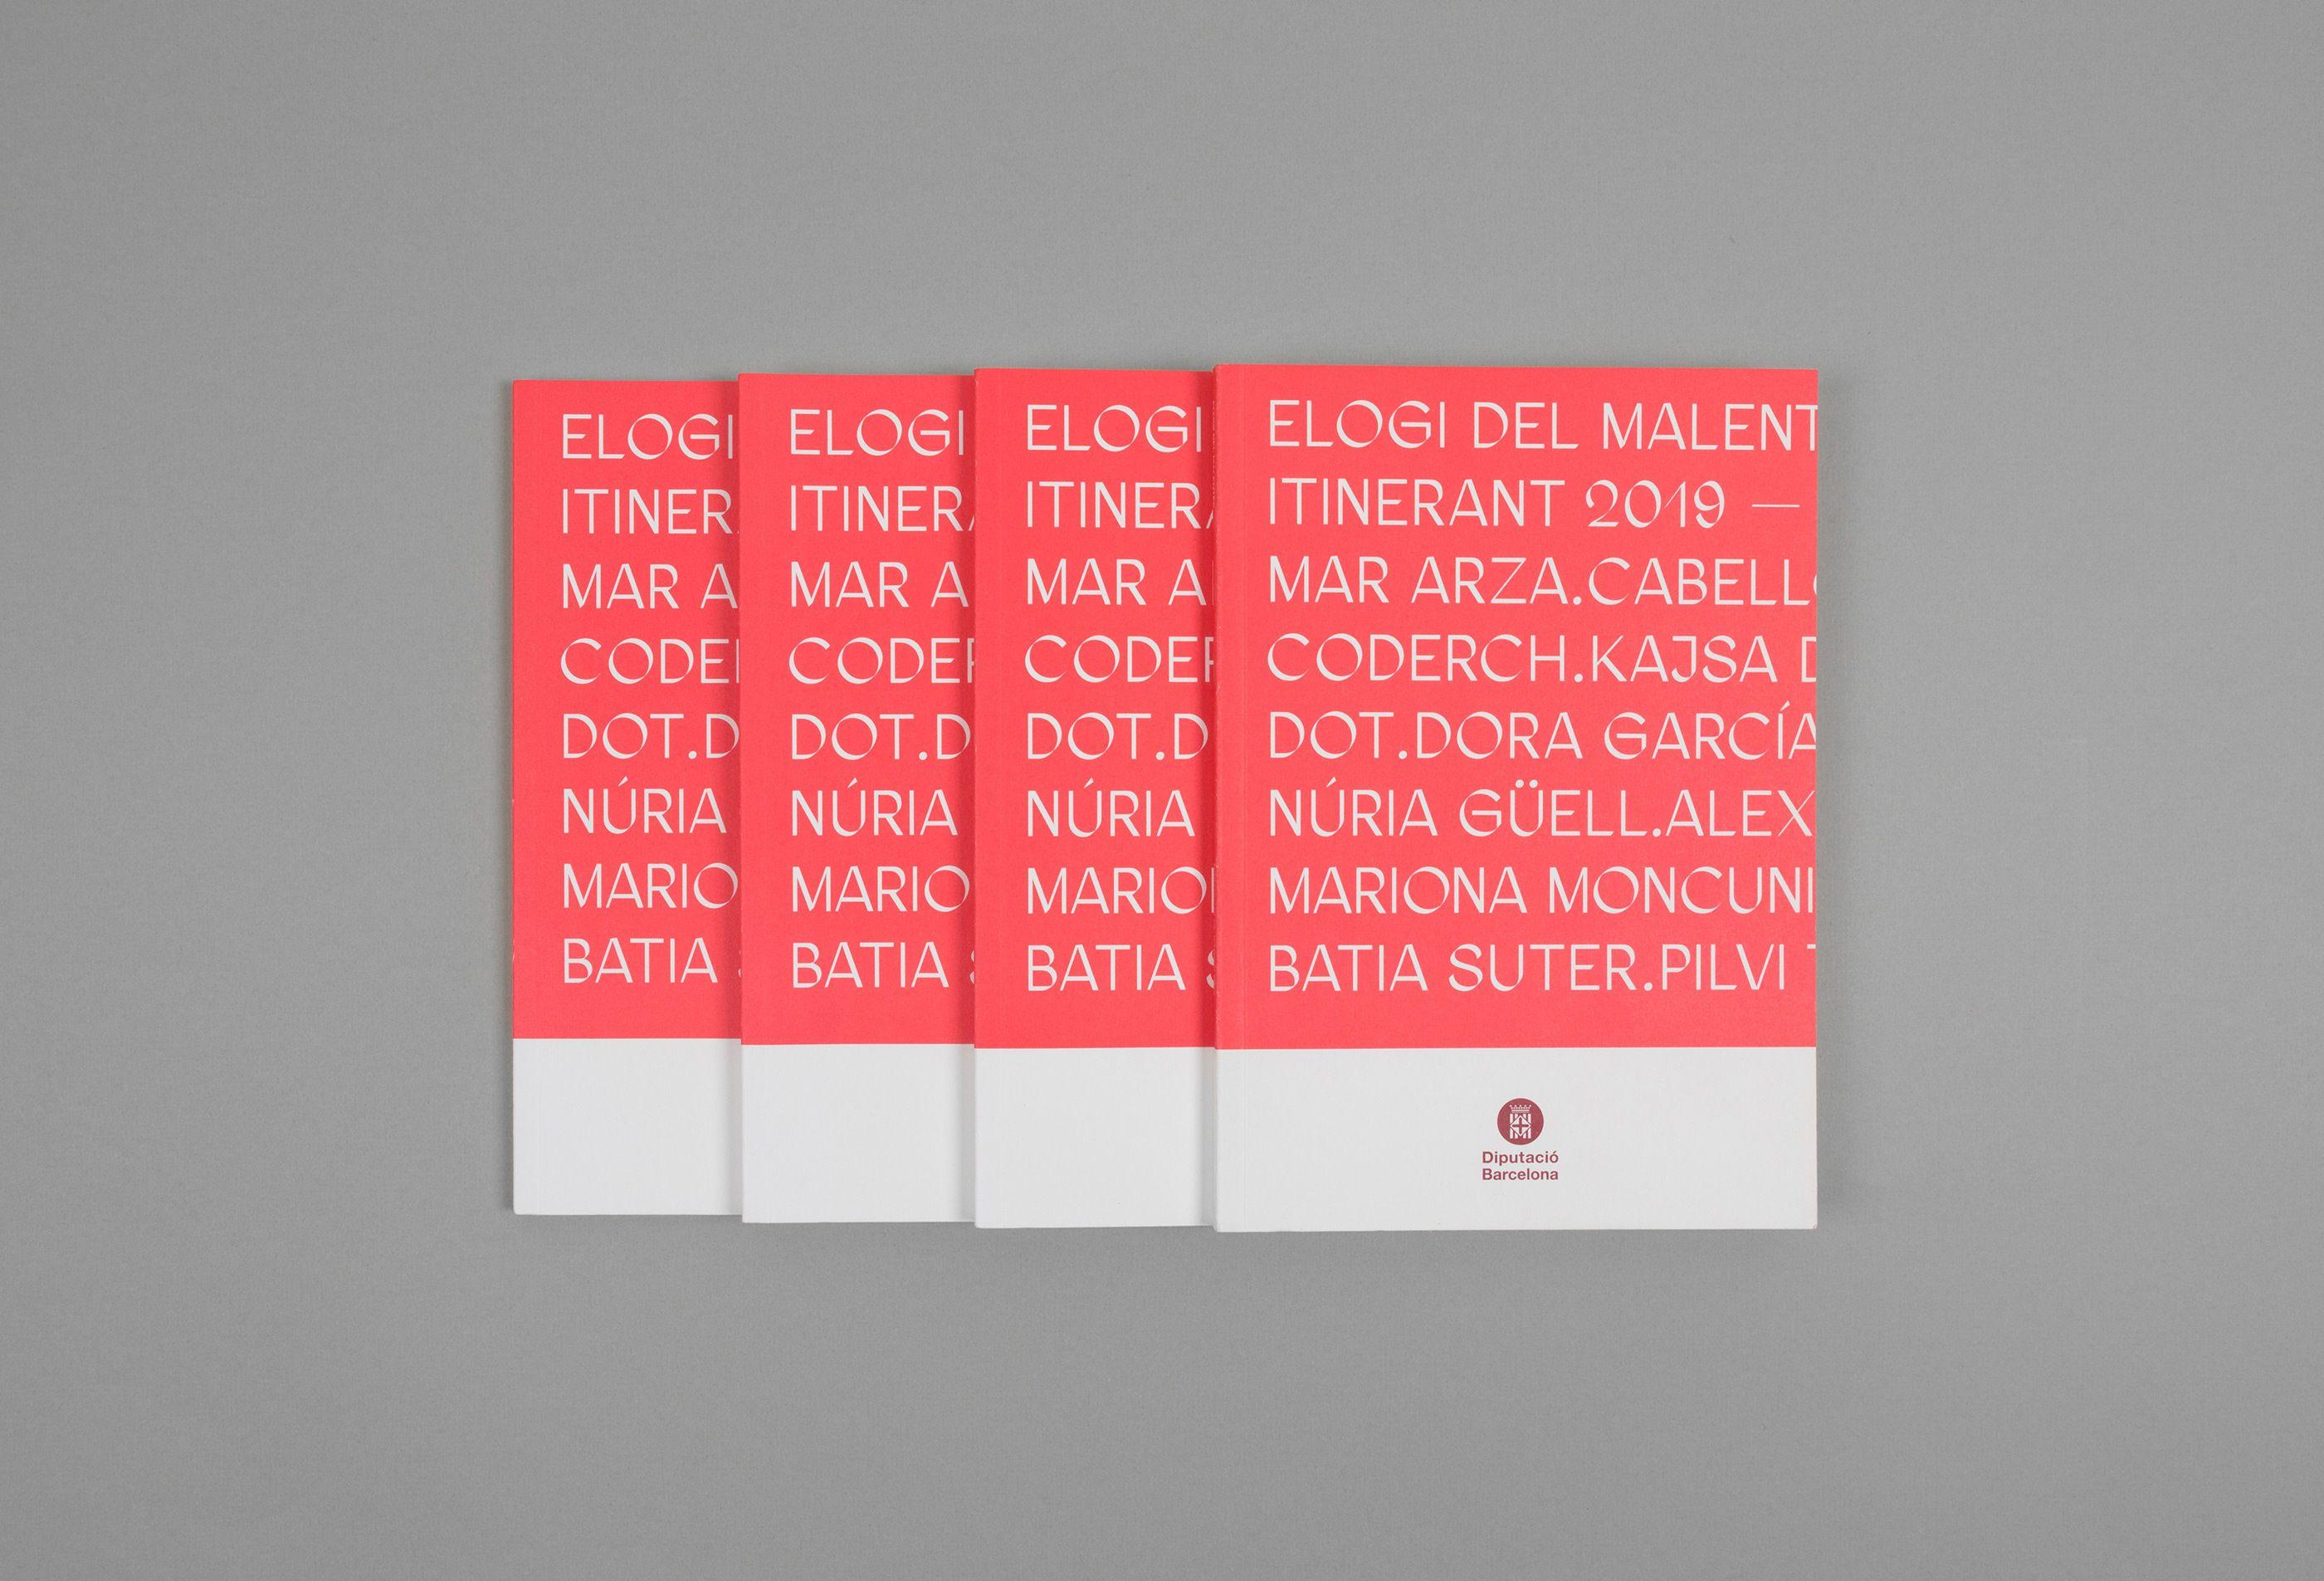 Elogi Del Malentes On Behance In 2020 Book Design Graphic Design Editorial Design